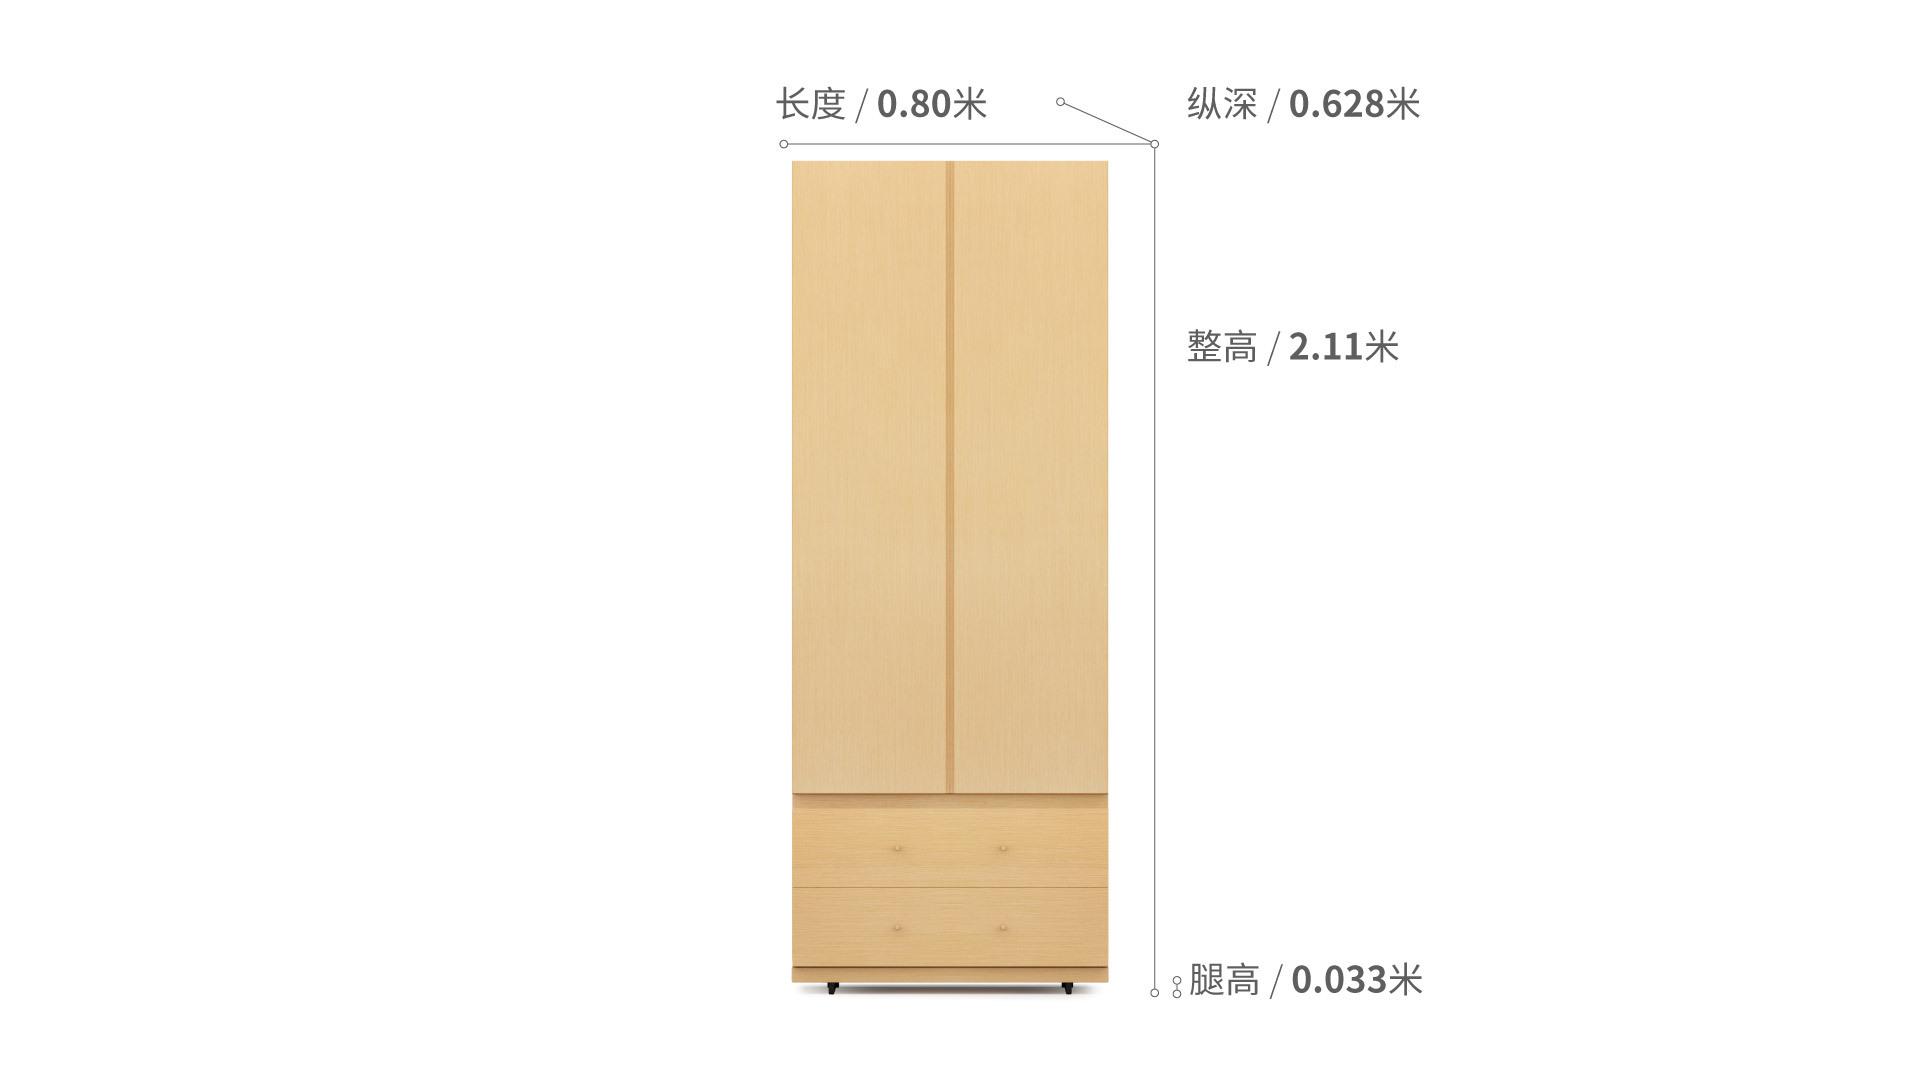 COSMO星格?衣柜·斗柜2.1米高2門衣柜E柜架效果圖